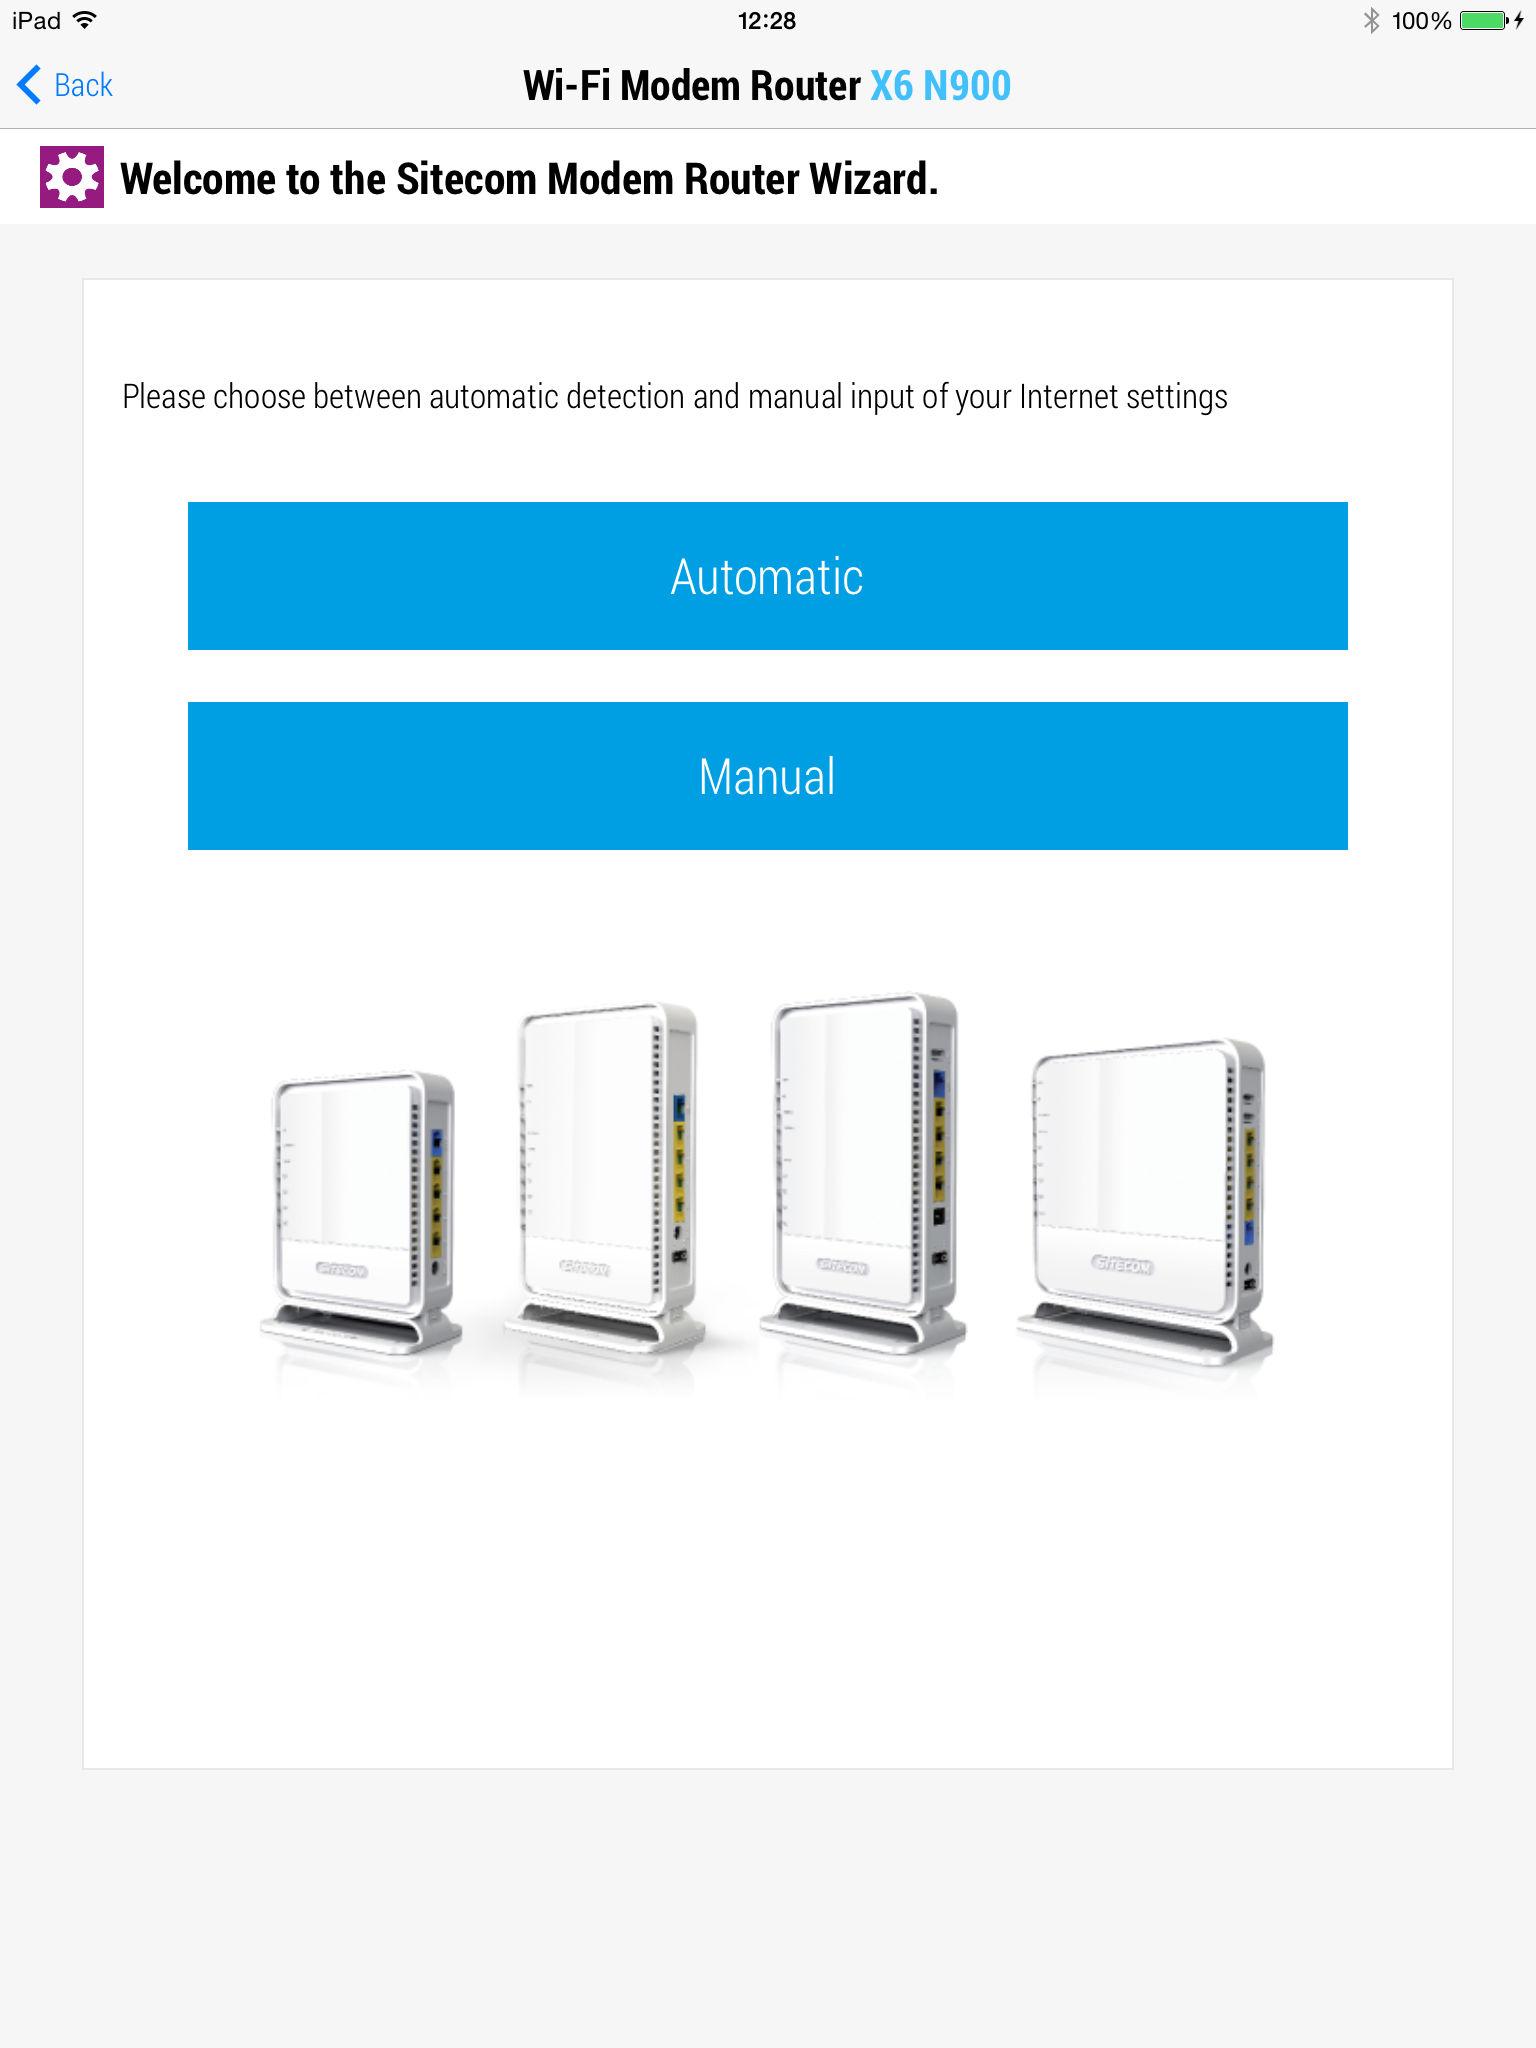 Sitecom WLR-5100 V1-001 Wi-Fi Router Driver Download